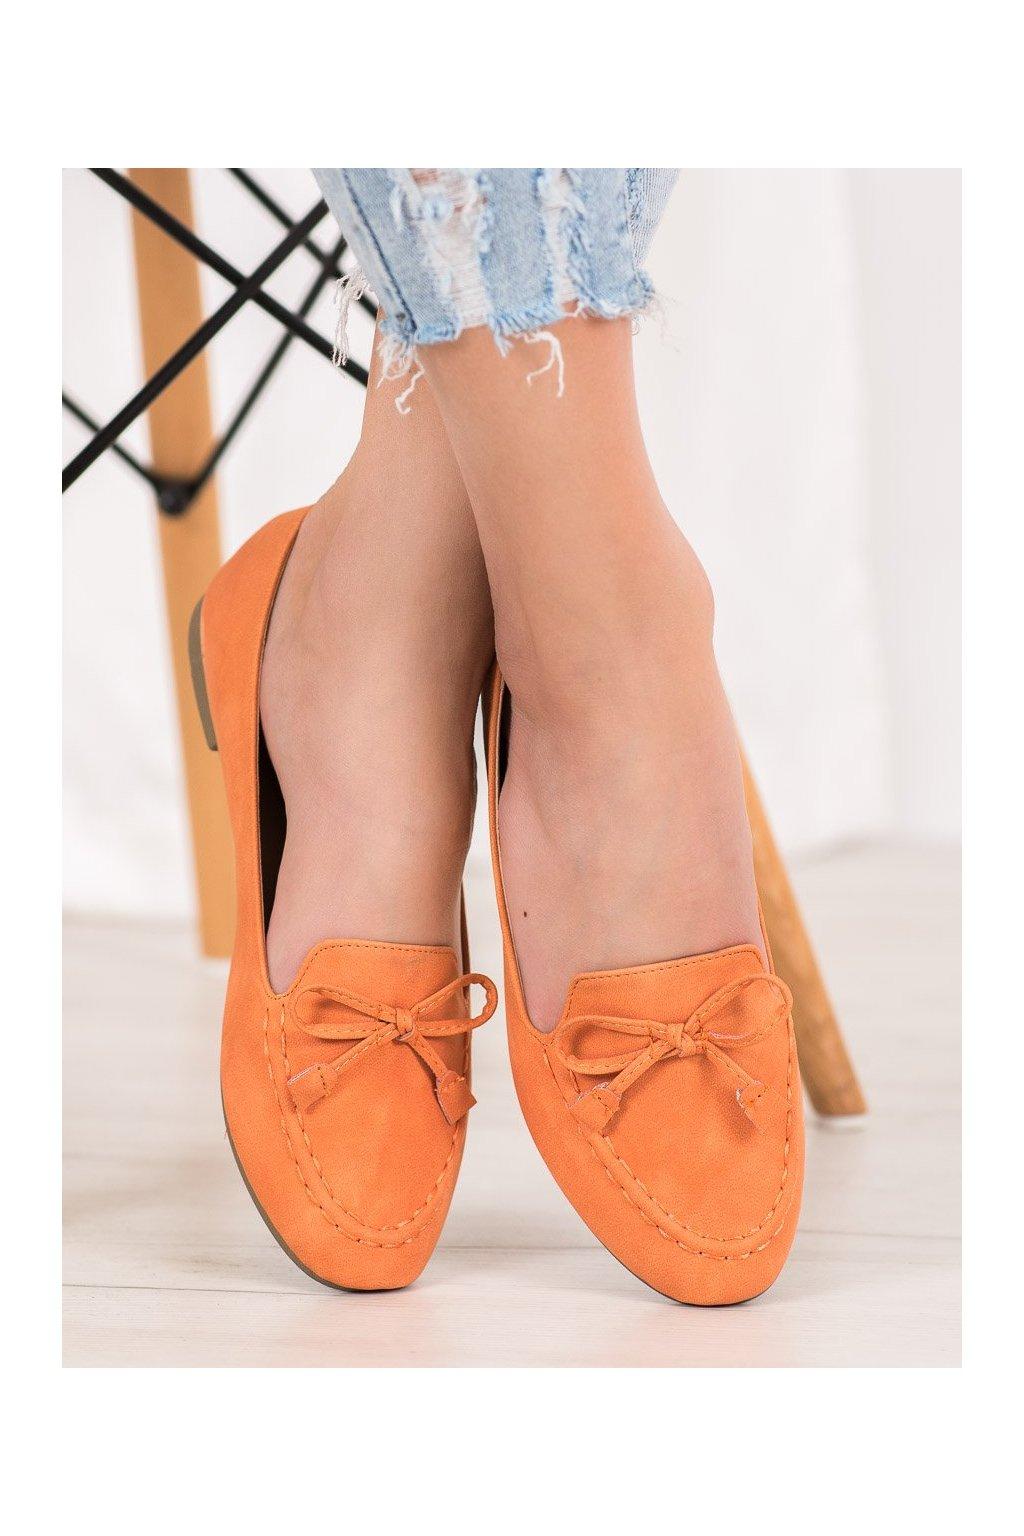 Oranžové mokasíny Nio nio kod 99-07A-OR